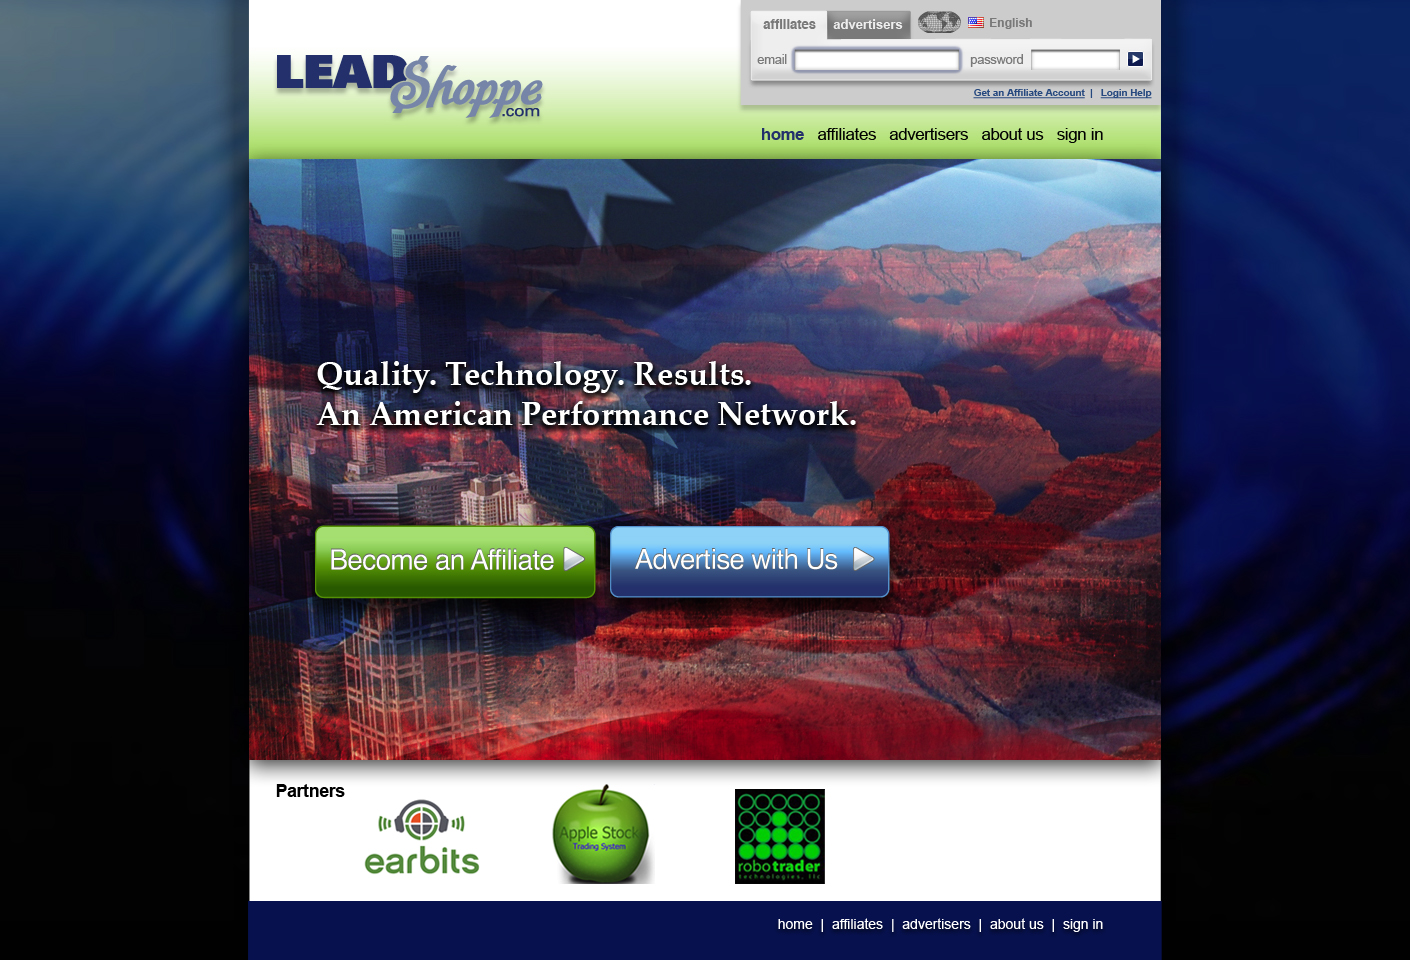 leadshoppe.com